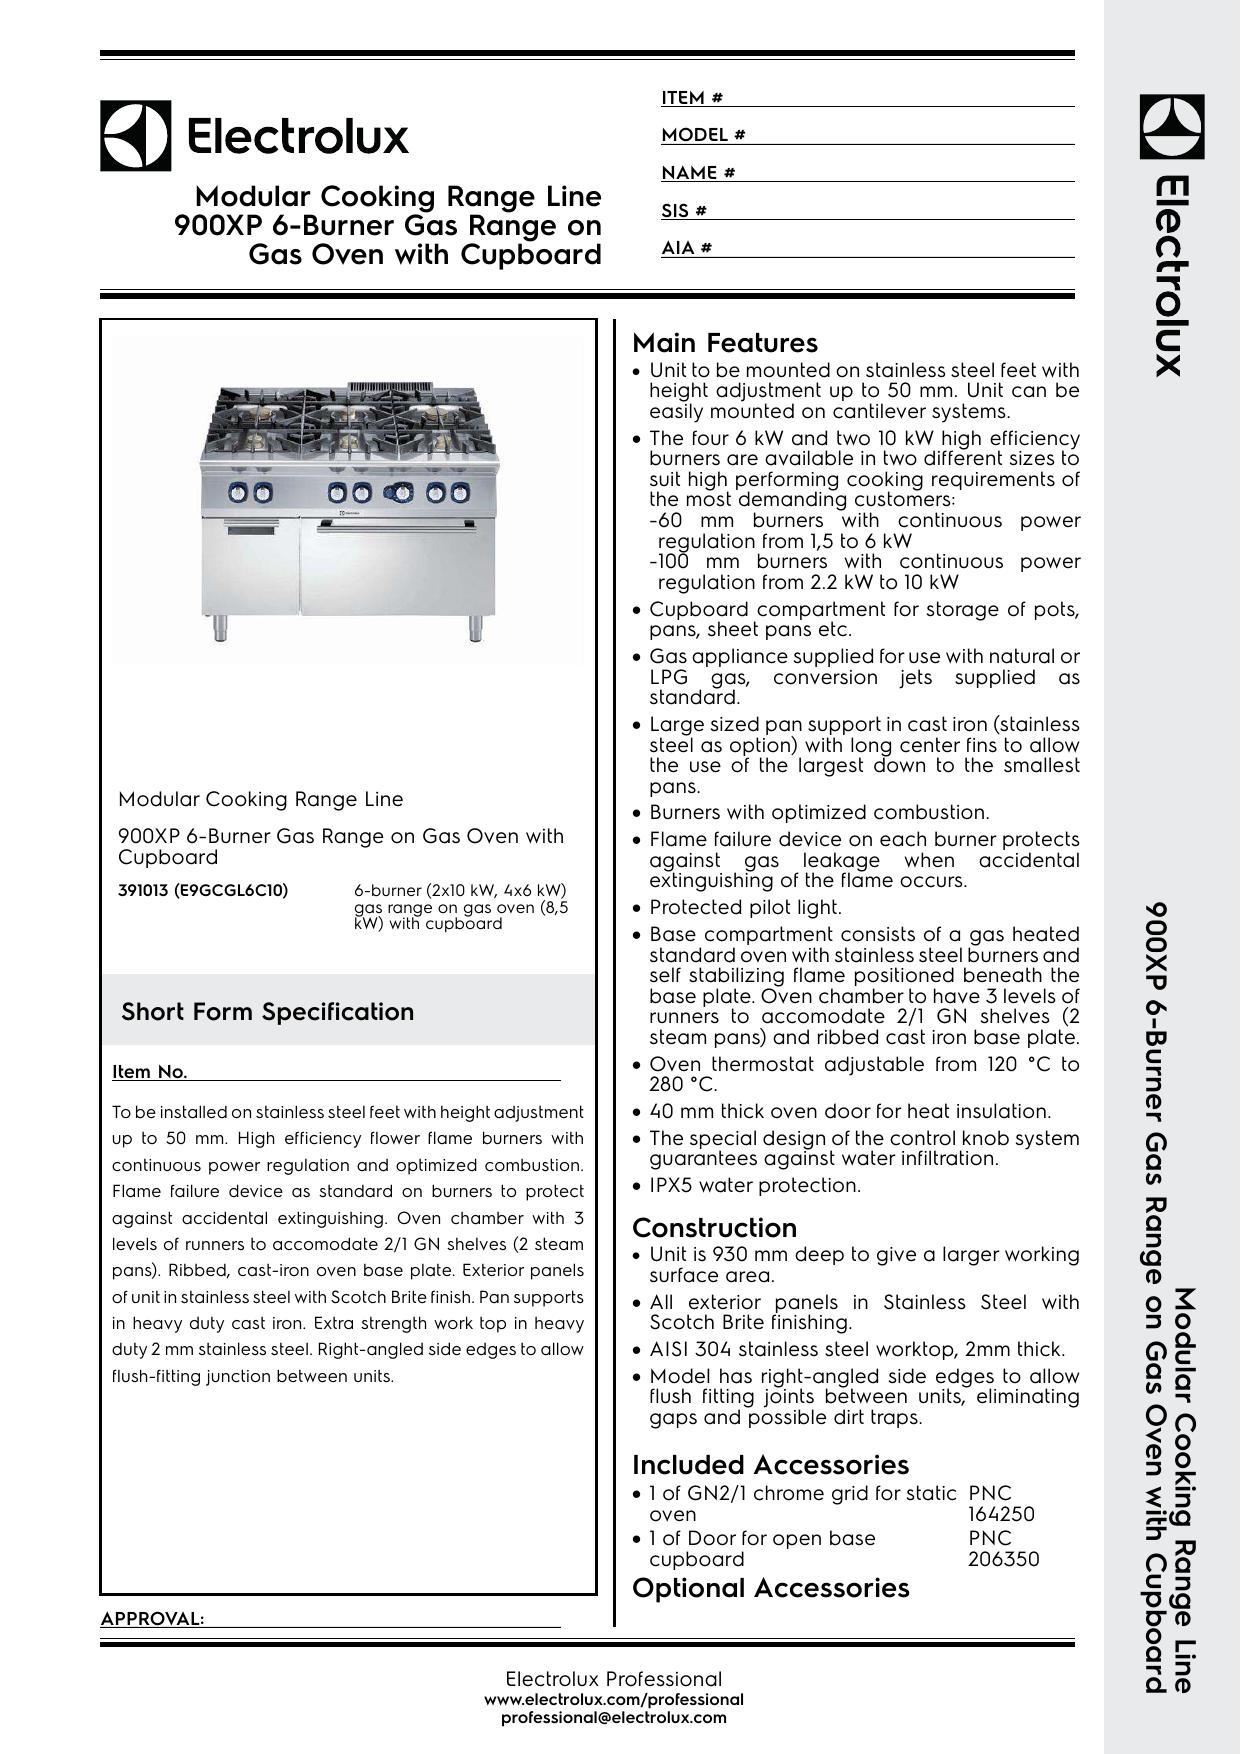 Modular Cooking Range Line 900XP 6-Burner Gas | manualzz com